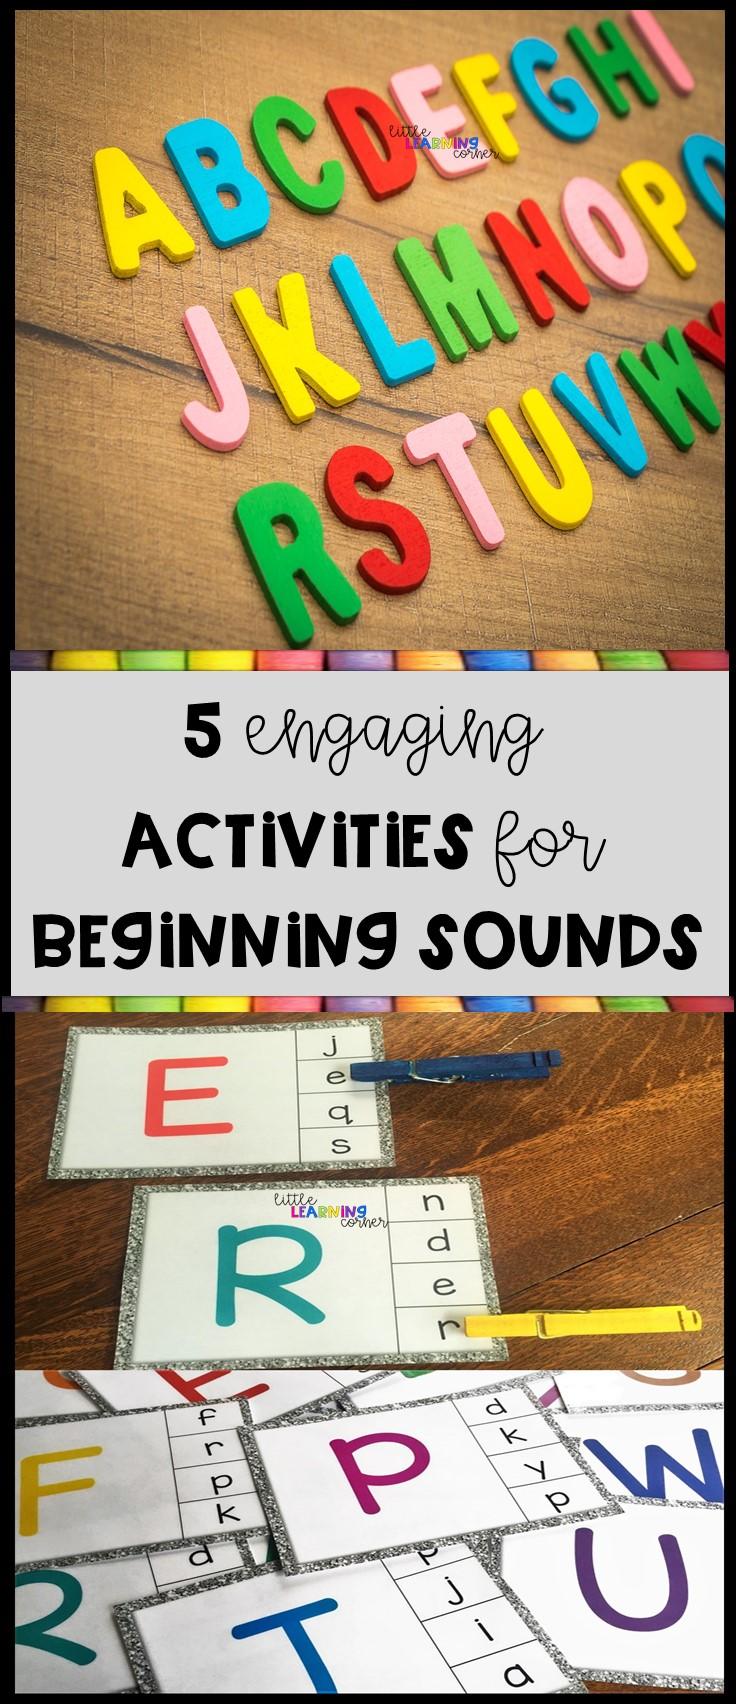 beginning-sounds-activities-pin